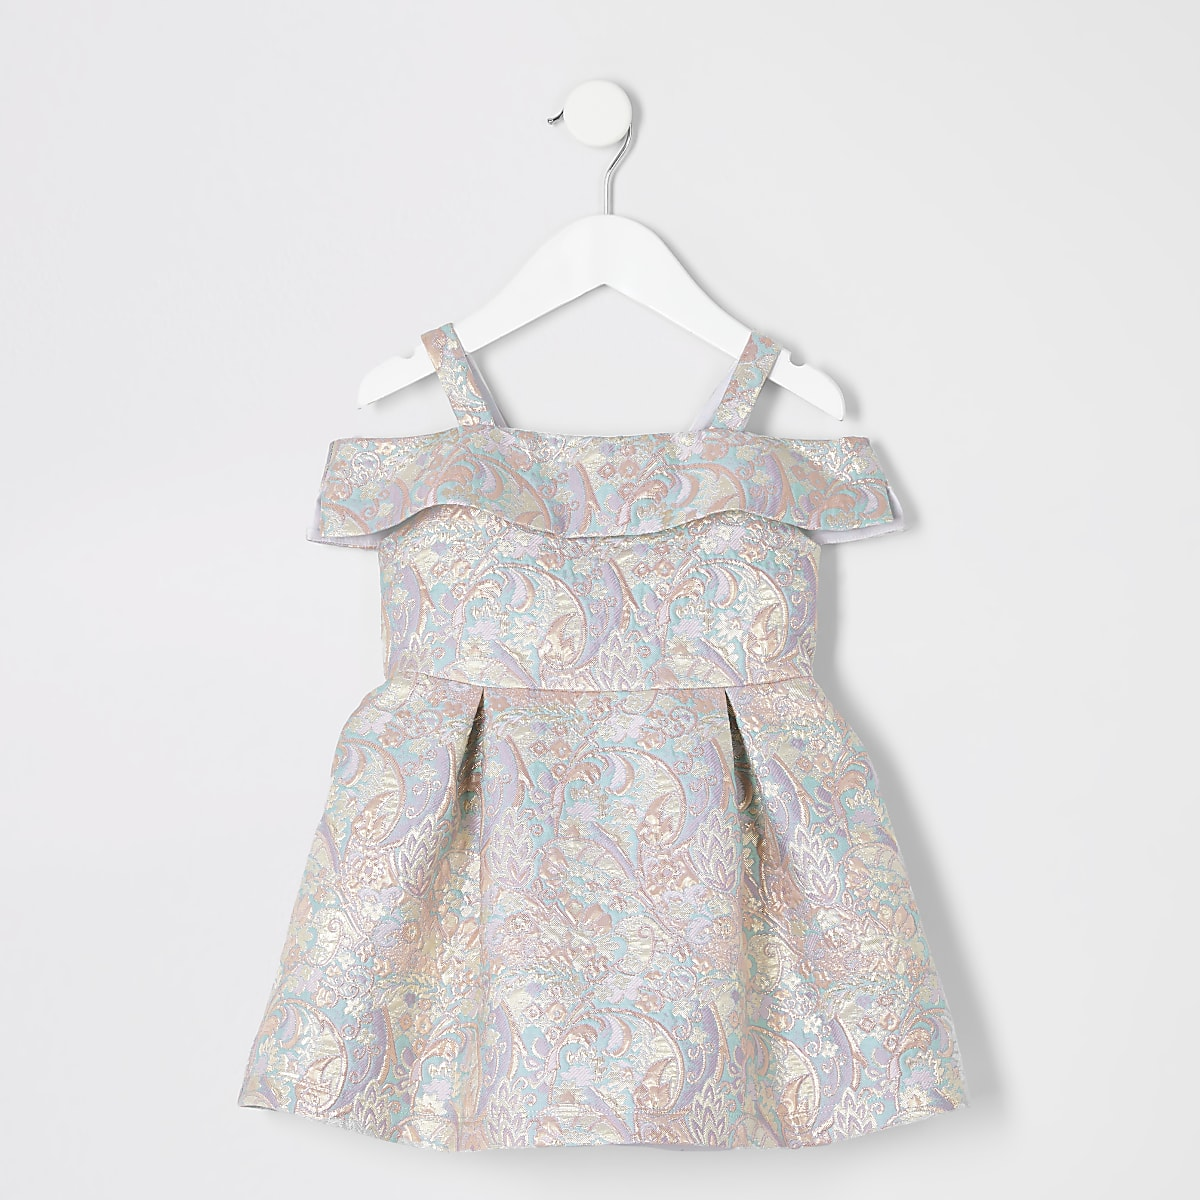 Mini - Goudkleurige jacquard jurk met bloemenprint voor meisjes